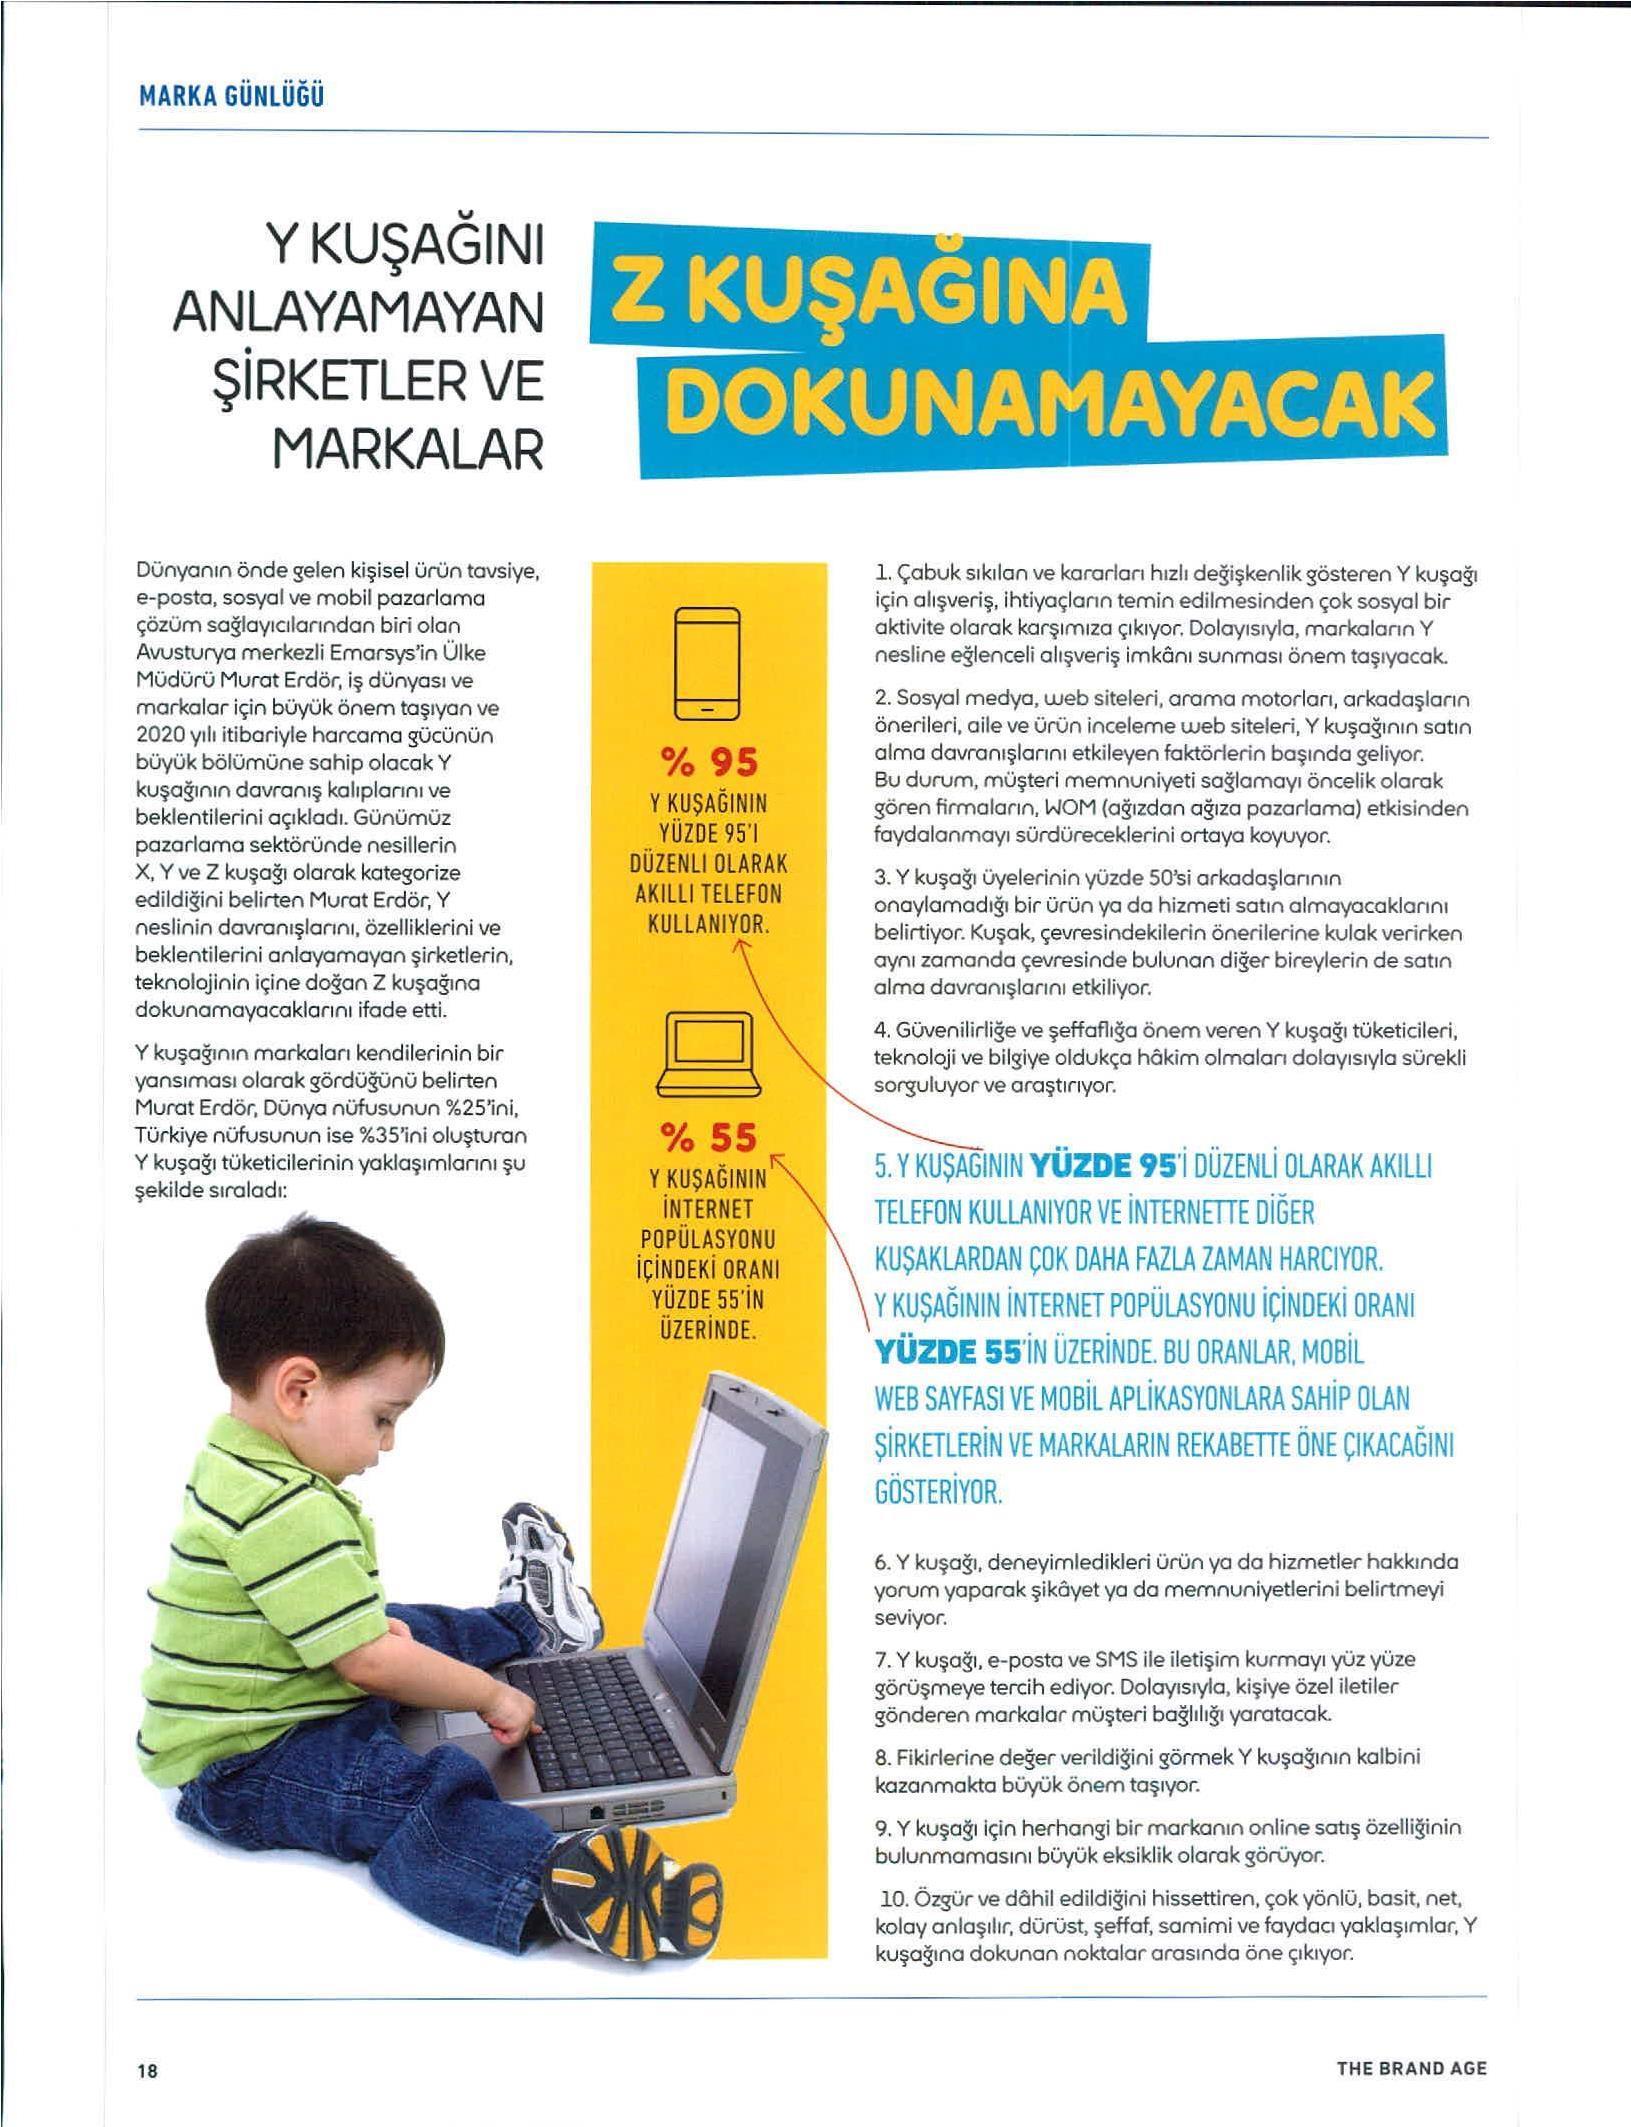 27 - Brand Age Dergisi_muraterdor.com_1.8.2015